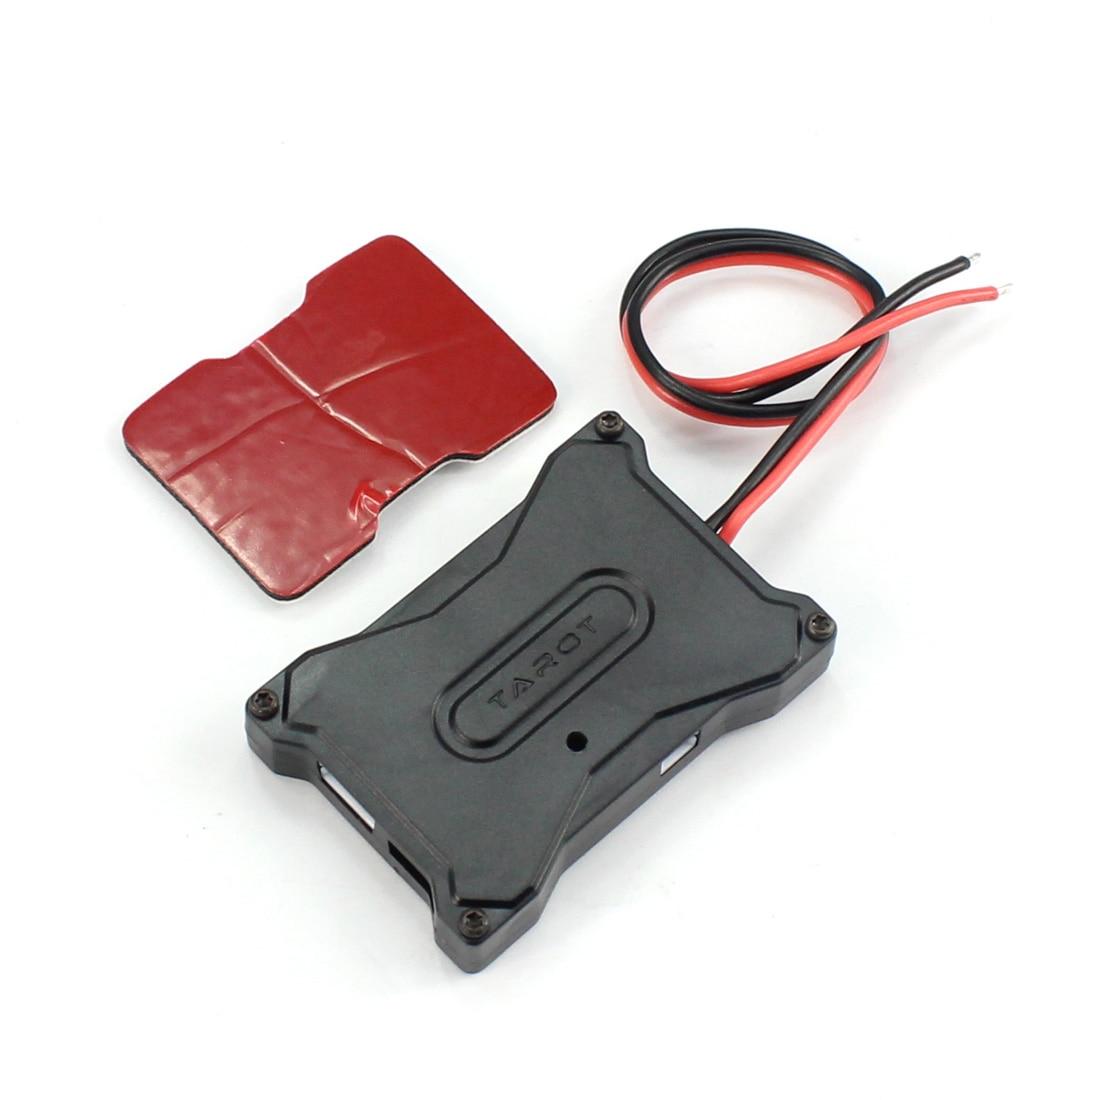 F11403 TL8X002  Electronic Retractable Landing Gear Controller for Quad Hexa Octa Multicopter